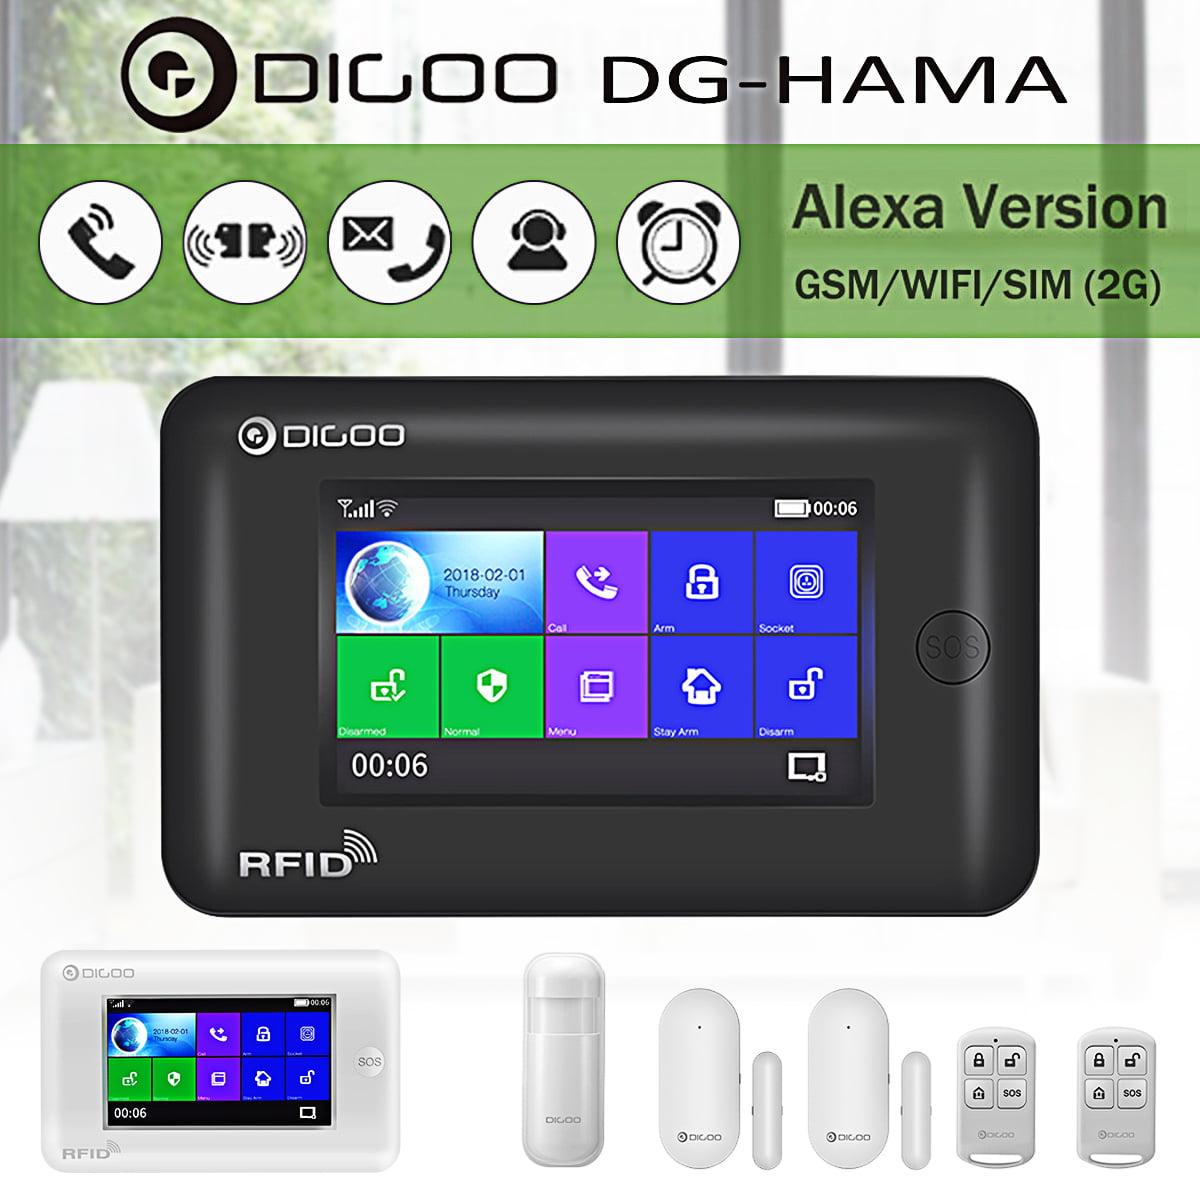 DIGOO DG-HAMA Touch Screen 433MHz GSM WIFI DIY Smart Home Burglar Security Alarm Alert System Accessories?Auto Dial Call SMS Message Push?Phone APP Control PIR Window Door Detector